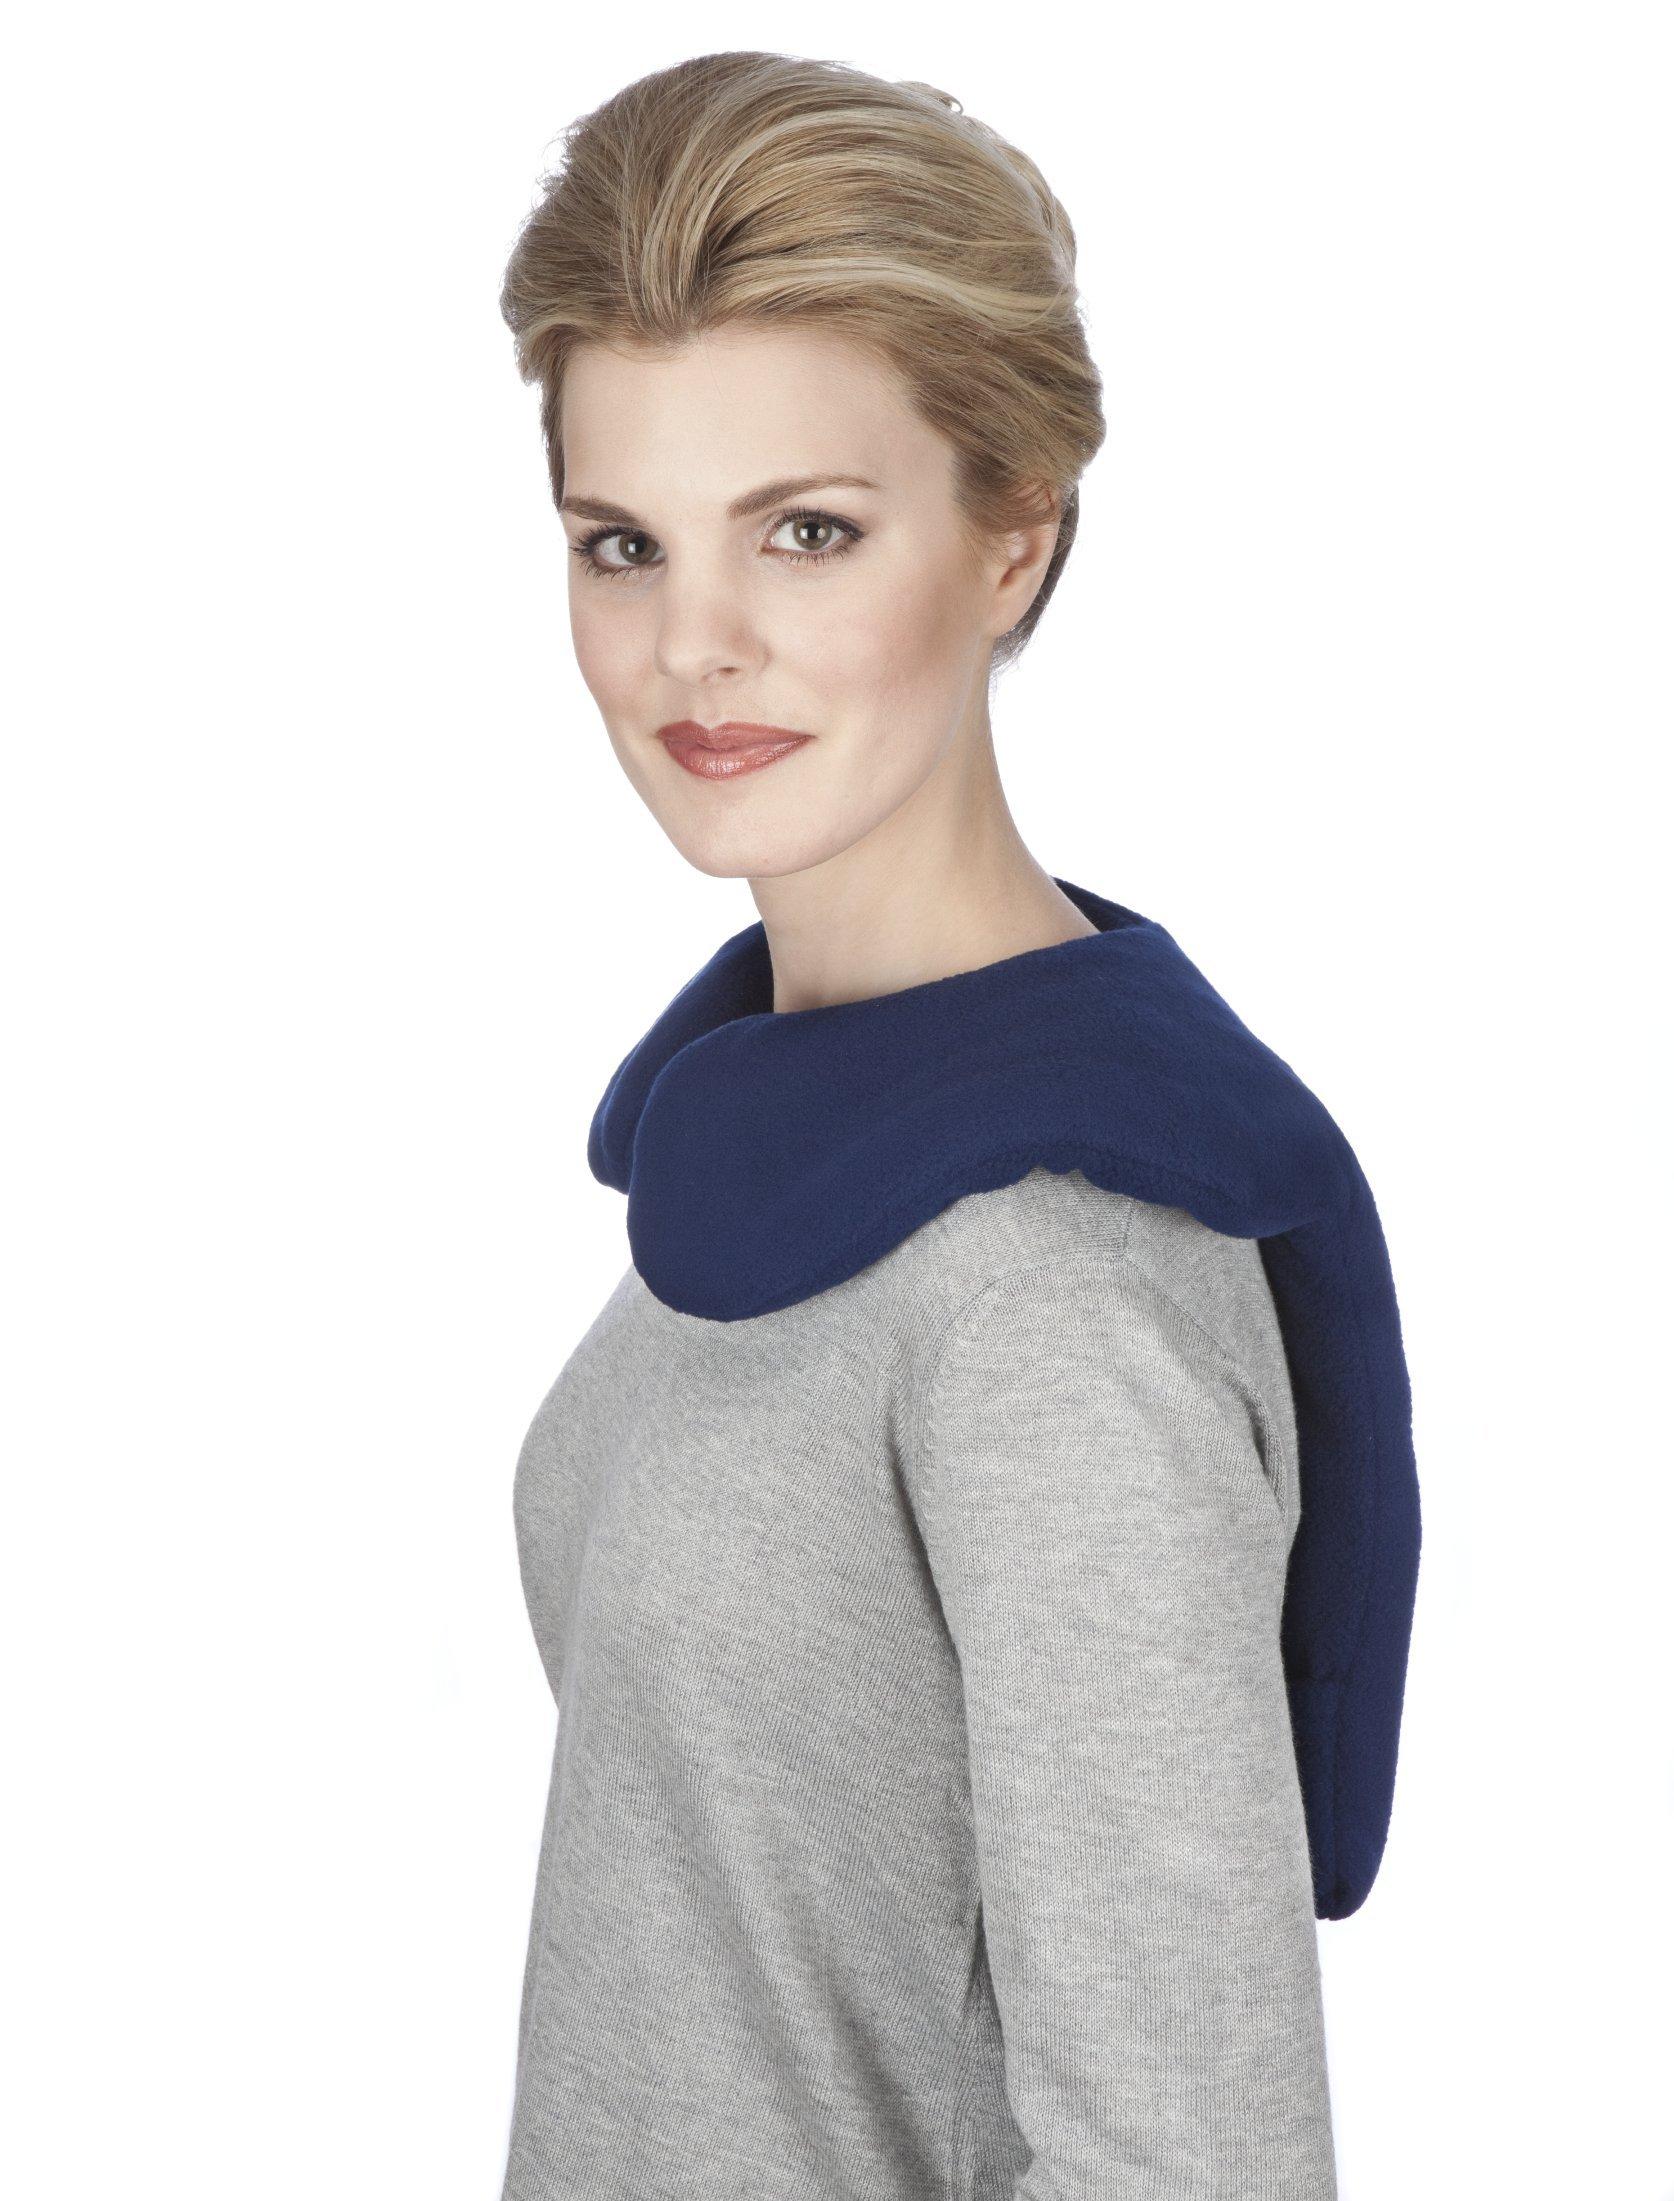 Sunny Bay Lavender-scented Shoulder and Upper Back Heat Wrap, Large, Navy blue (navy blue) by Sunny Bay (Image #7)